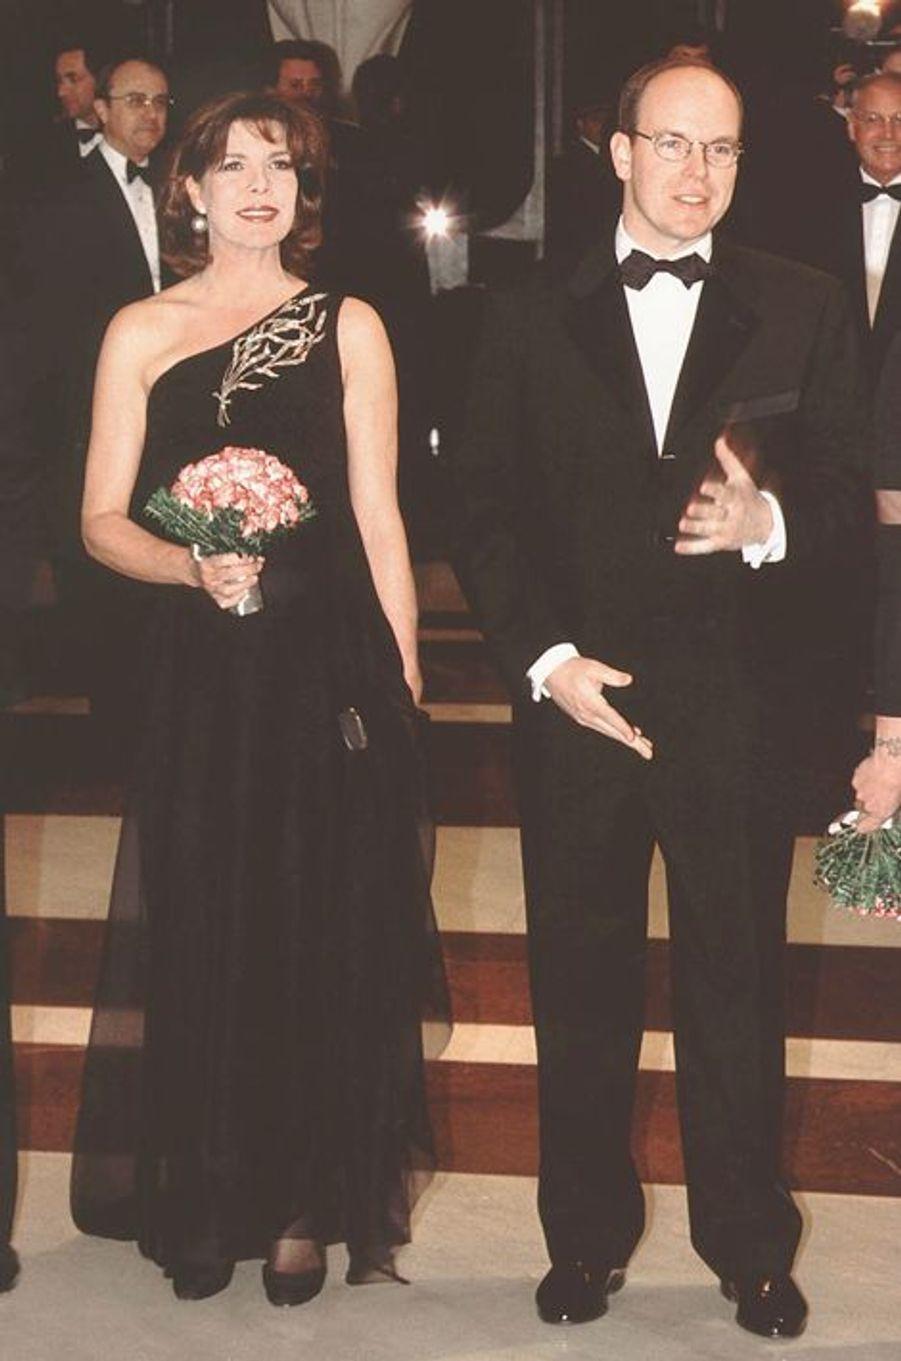 La princesse Caroline de Monaco au bal de la Rose 1999, avec le prince Albert II